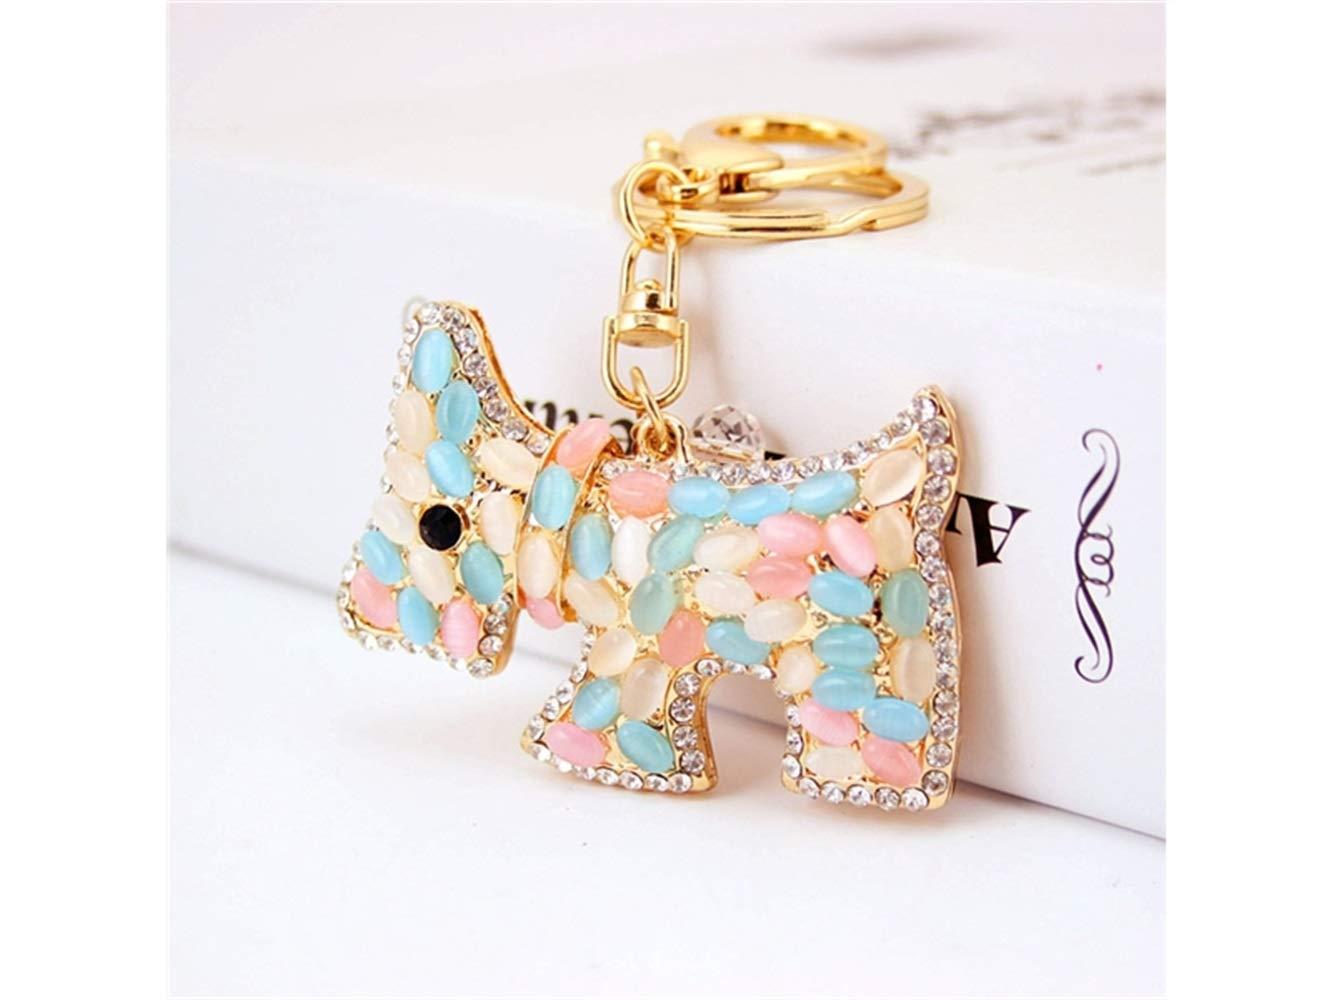 Special Creative Exquisite Opal Dog Keychain Animal Key Trinket Car Bag Key Holder Decorations(Colorful) Bag Pendant